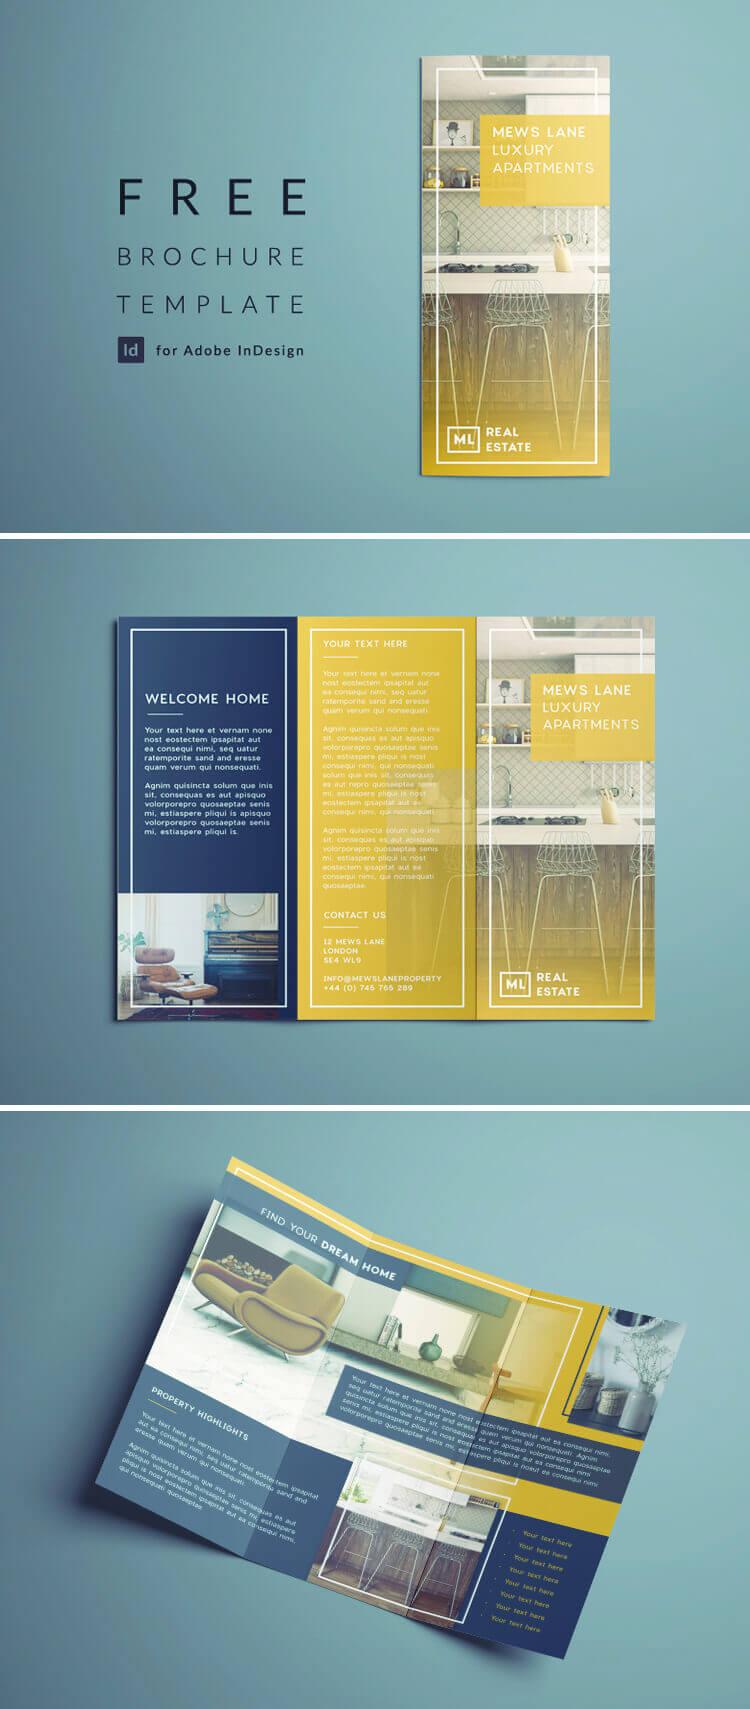 Tri Fold Brochure | Free Indesign Template Regarding Adobe Indesign Tri Fold Brochure Template